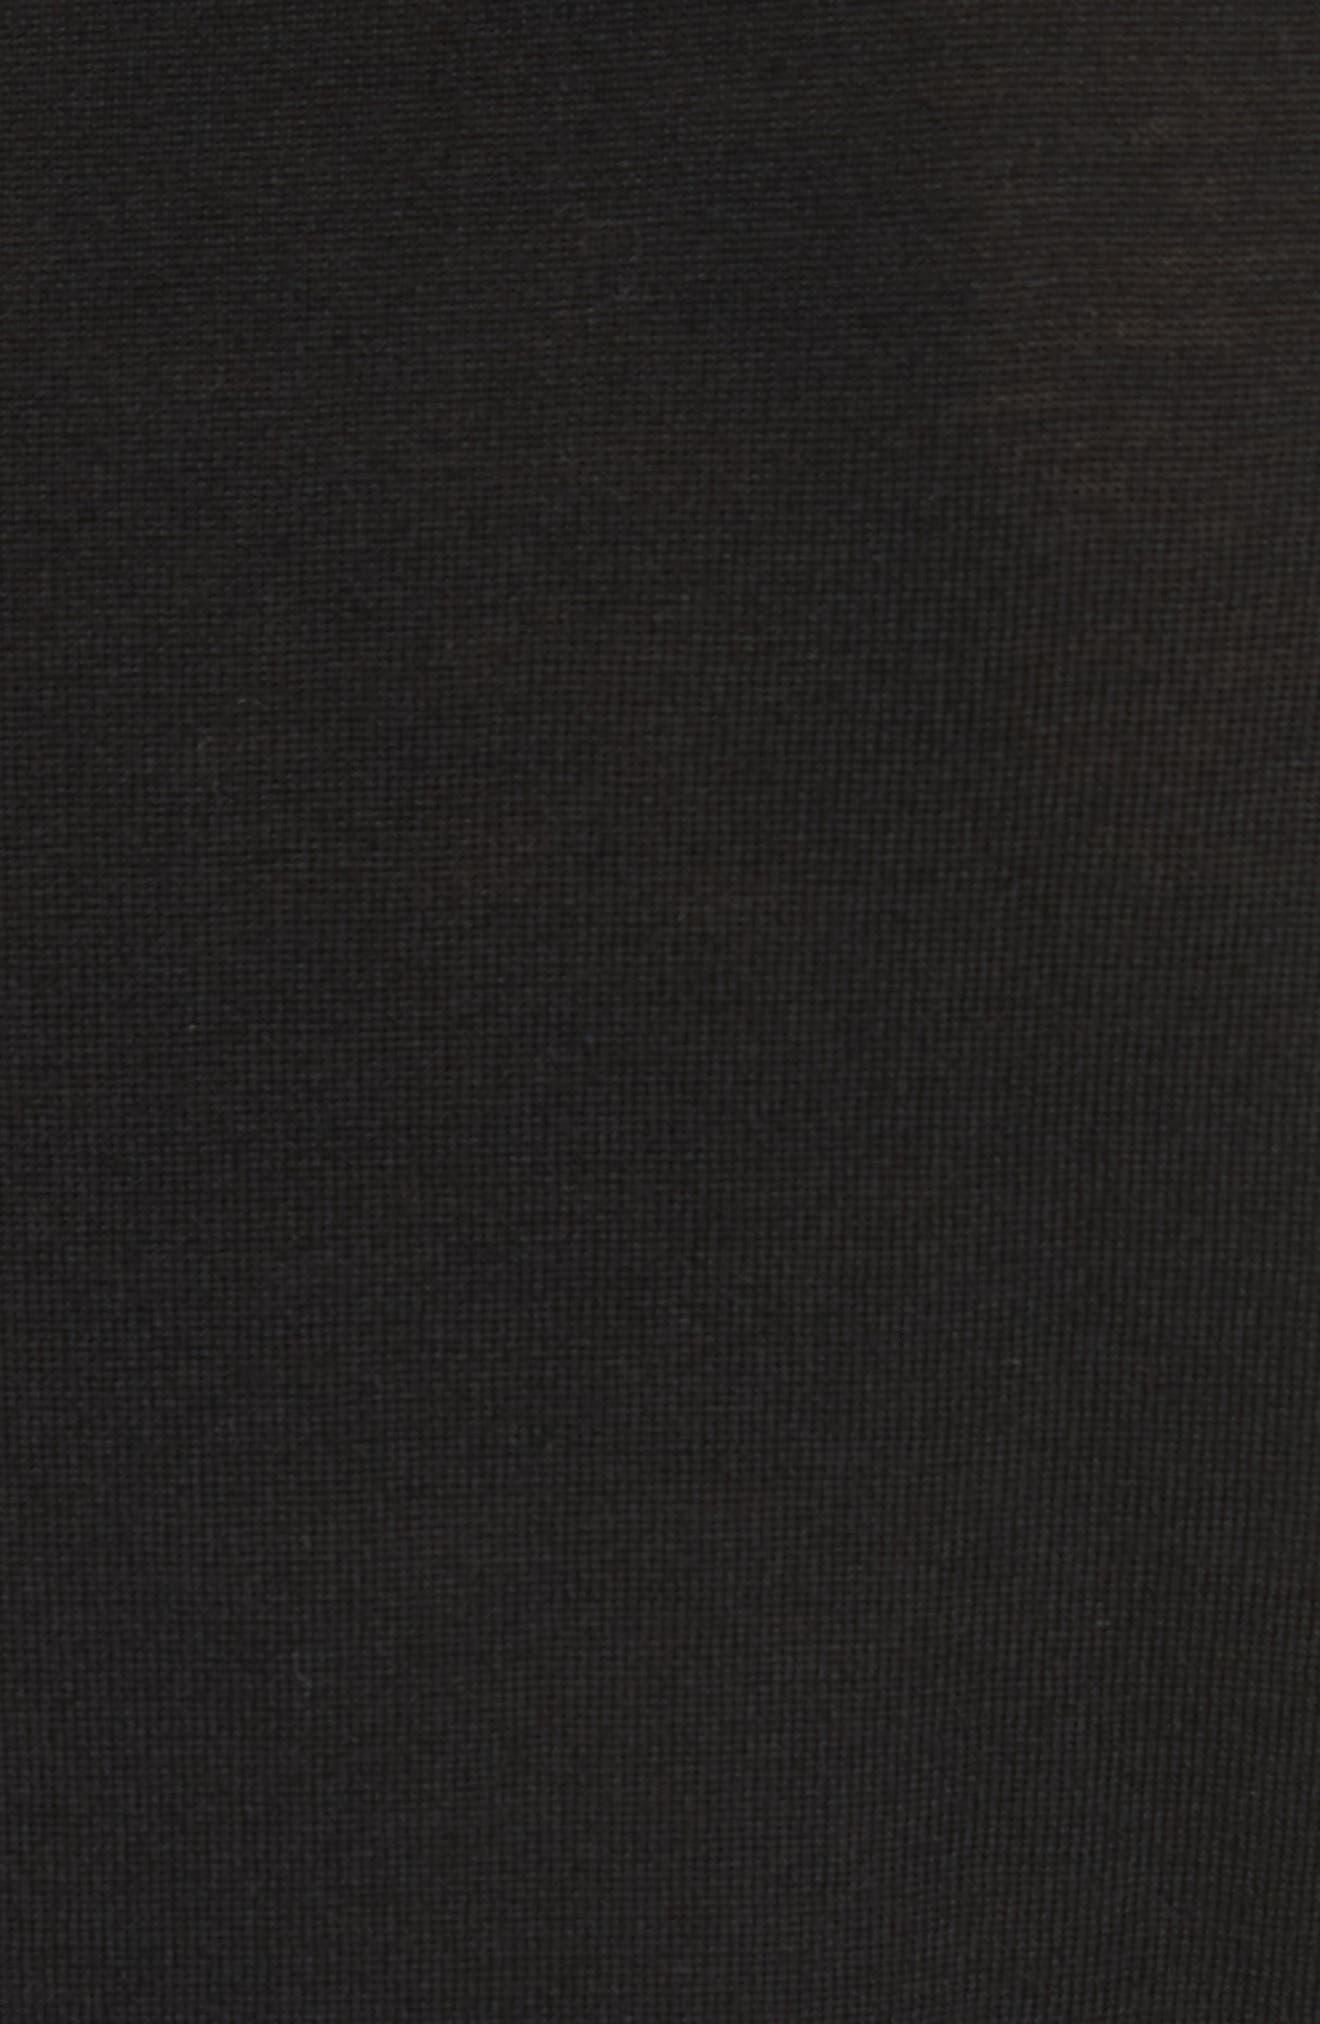 Circle Merino Wool Blend Sweater,                             Alternate thumbnail 5, color,                             001